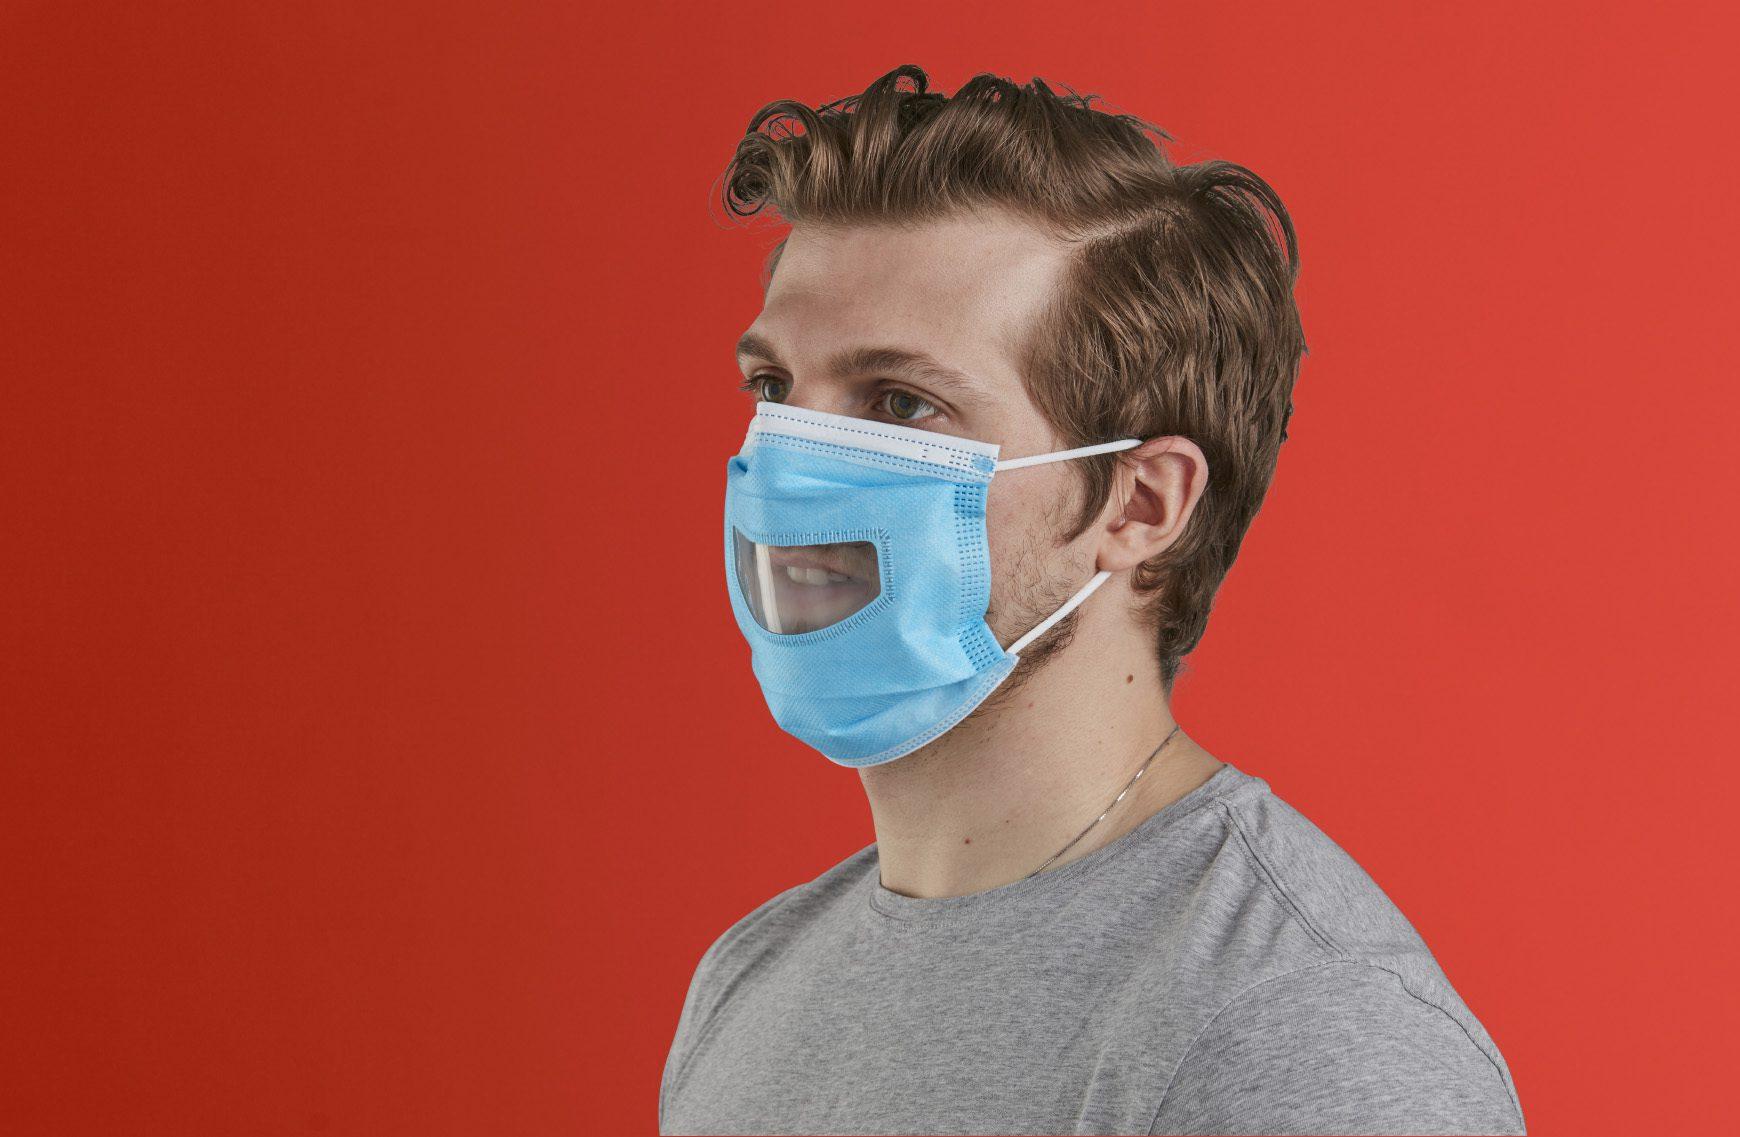 Man wearing ppe face mask